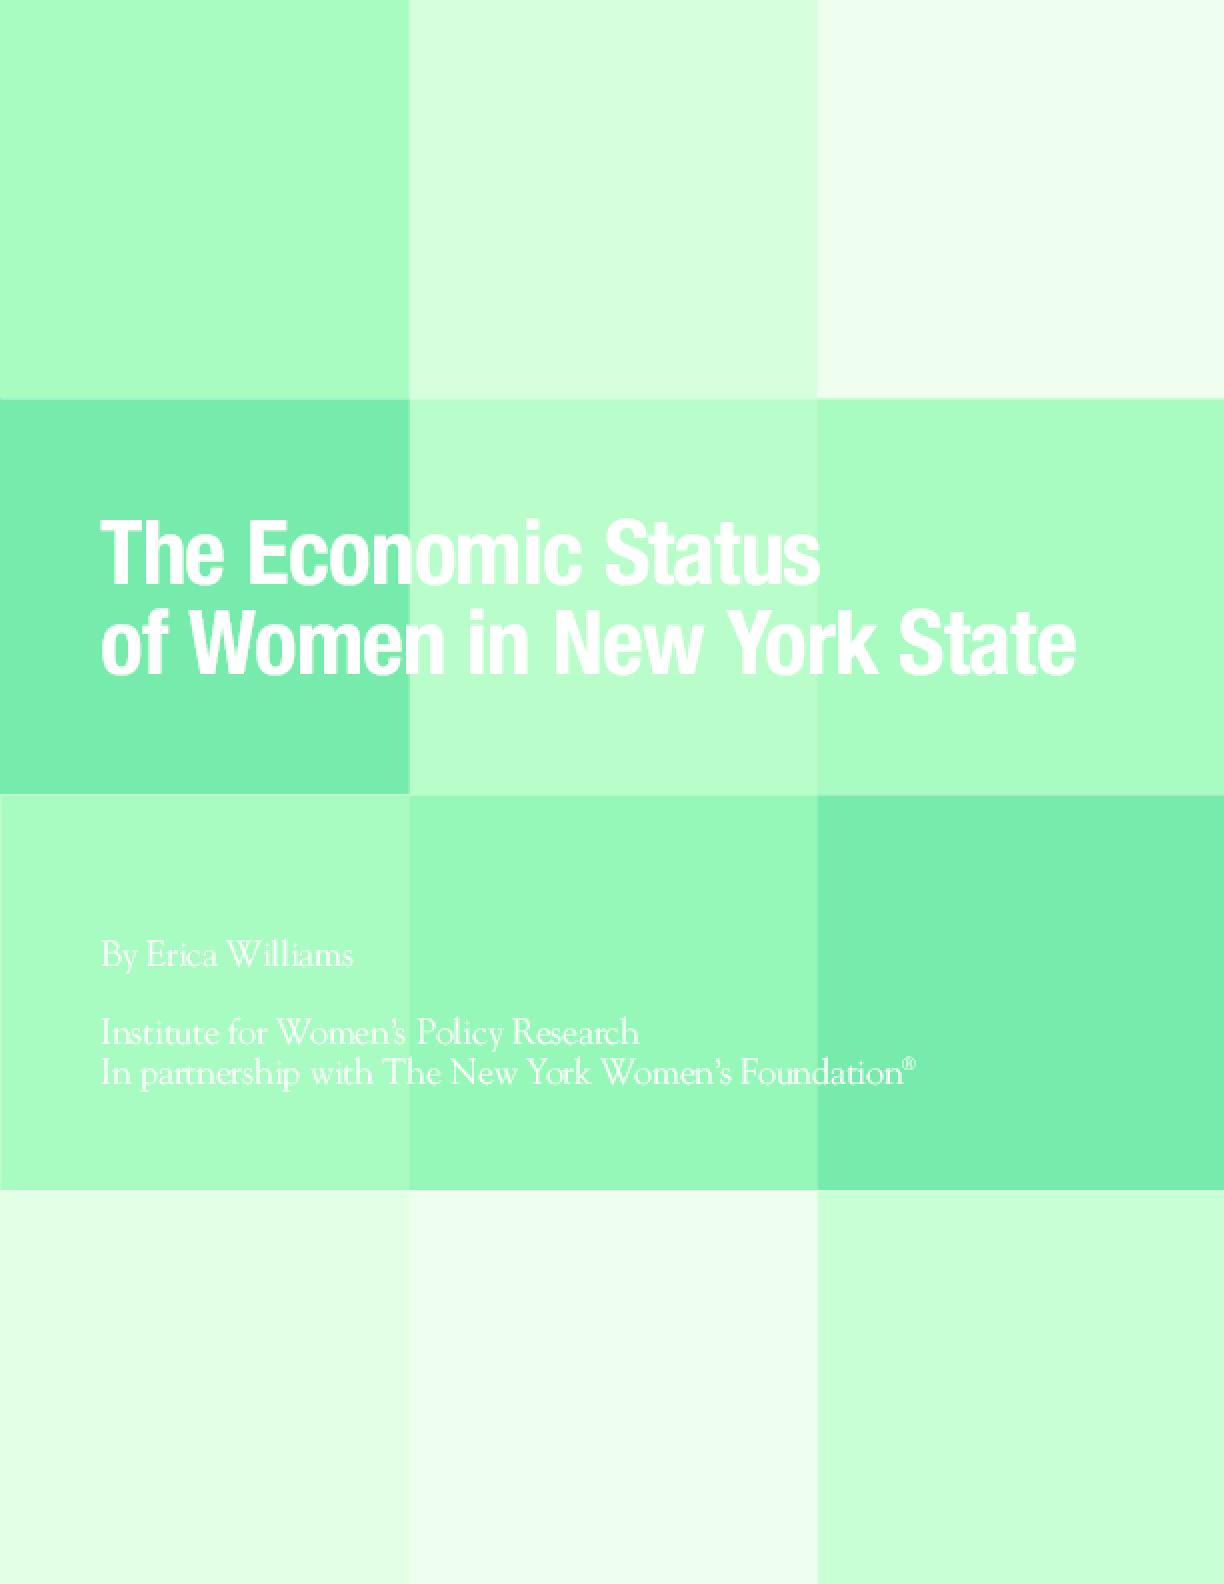 The Economic Status of Women in New York State